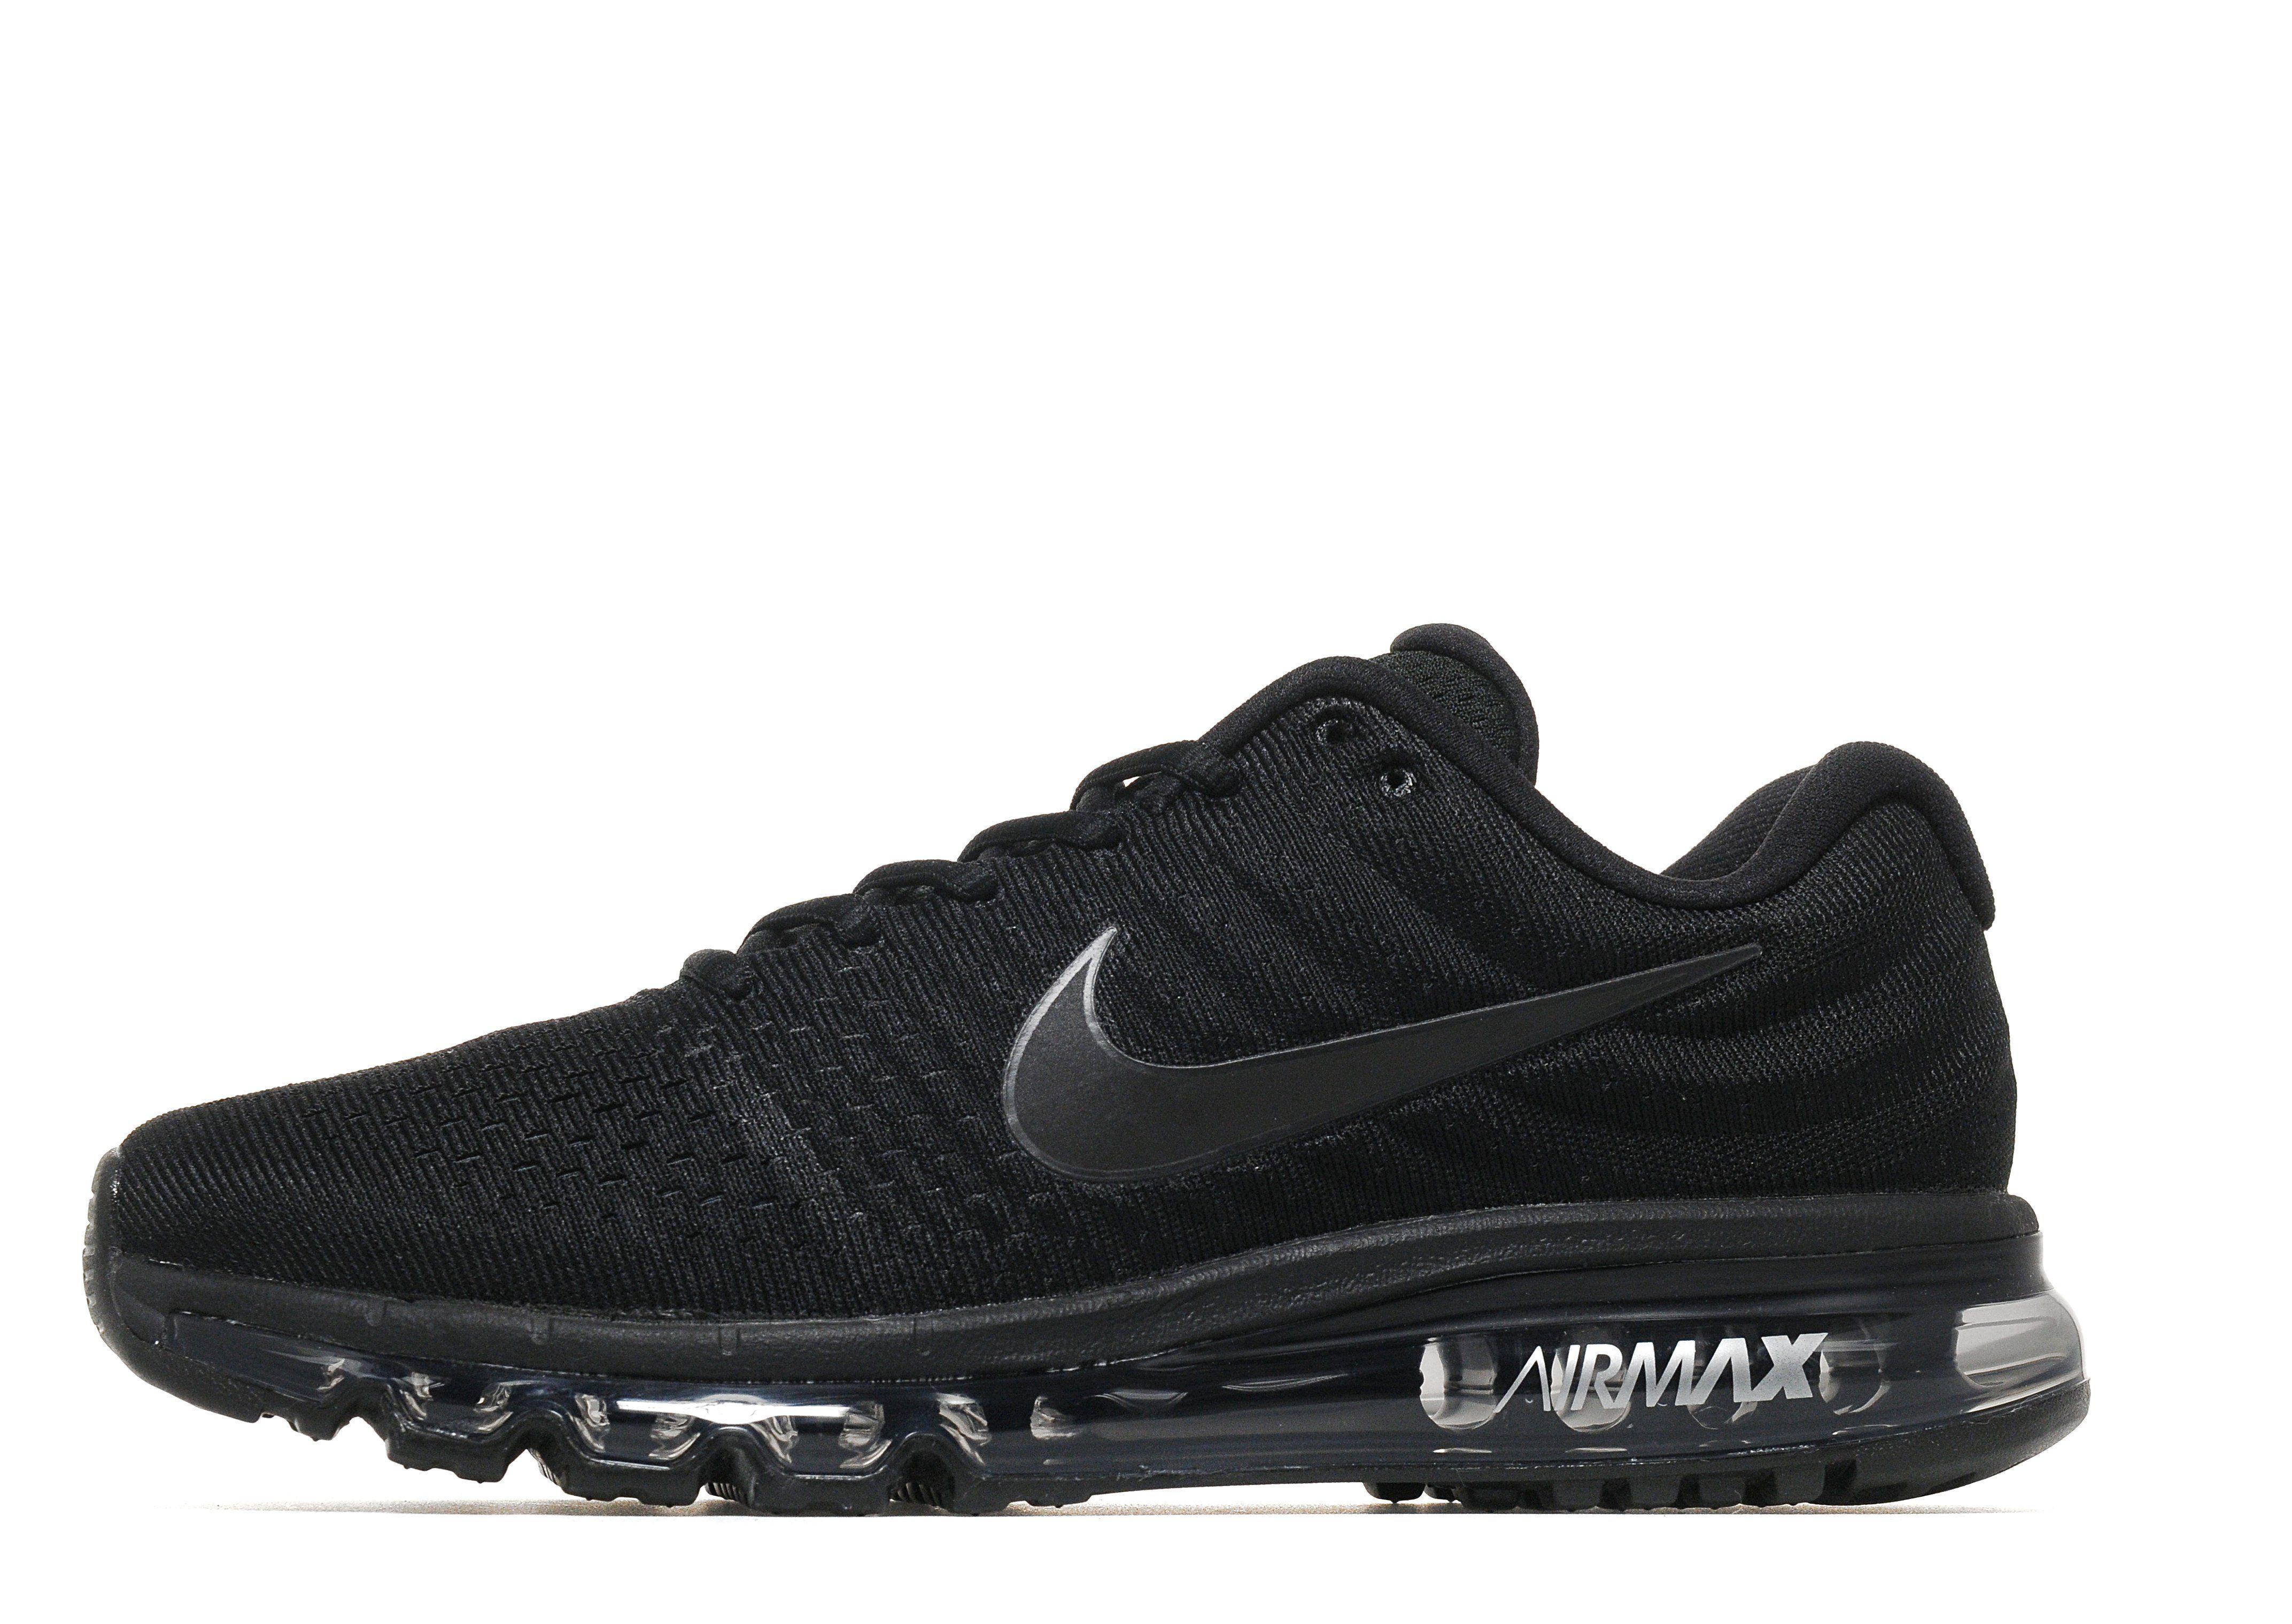 air max 2017 mens fashion outdoor running shoes